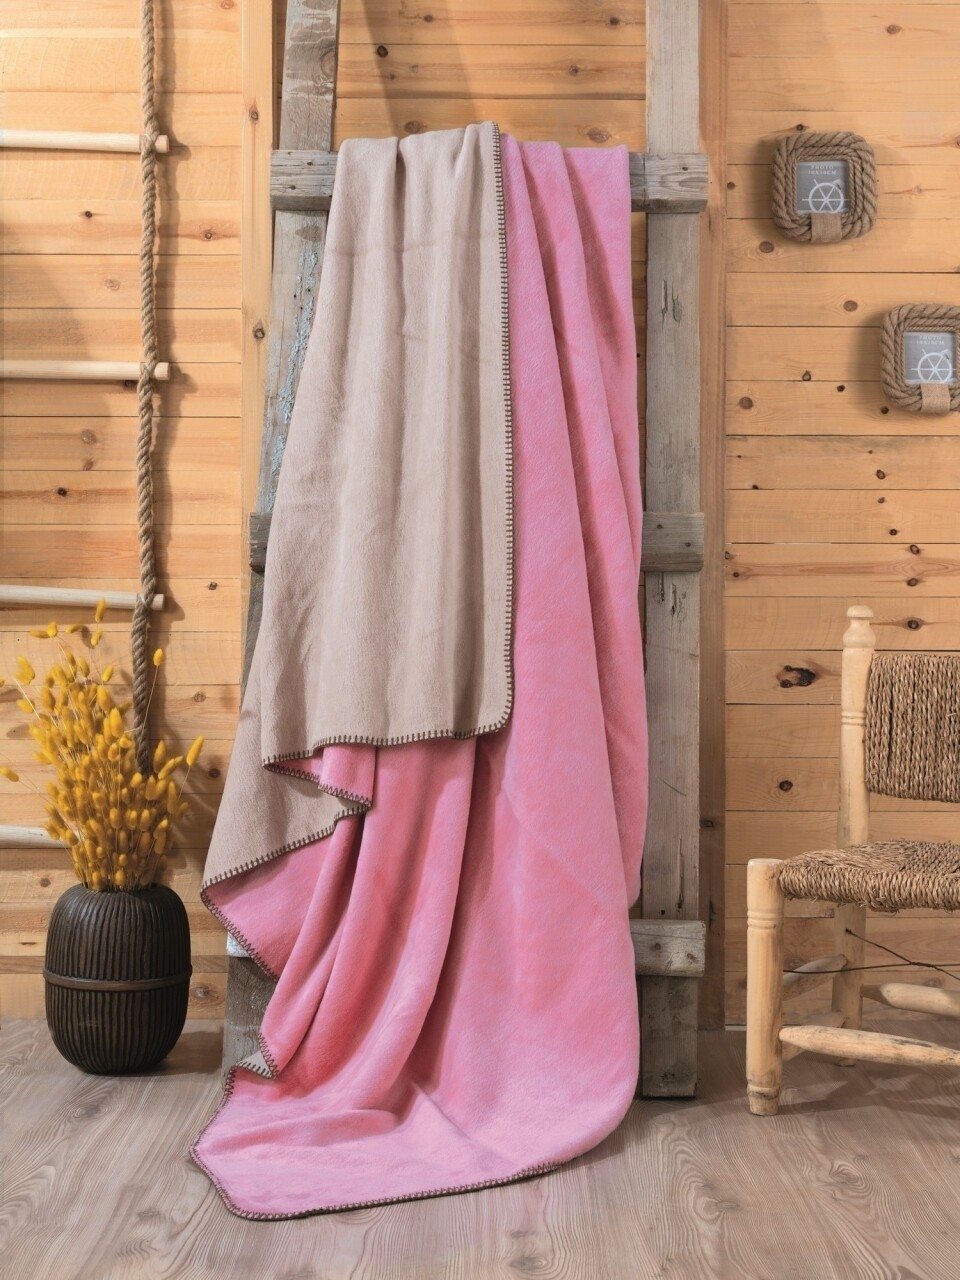 Patura pentru pat dublu din bumbac si acrylic, 200x200 cm, Cotton Box, roz/bej